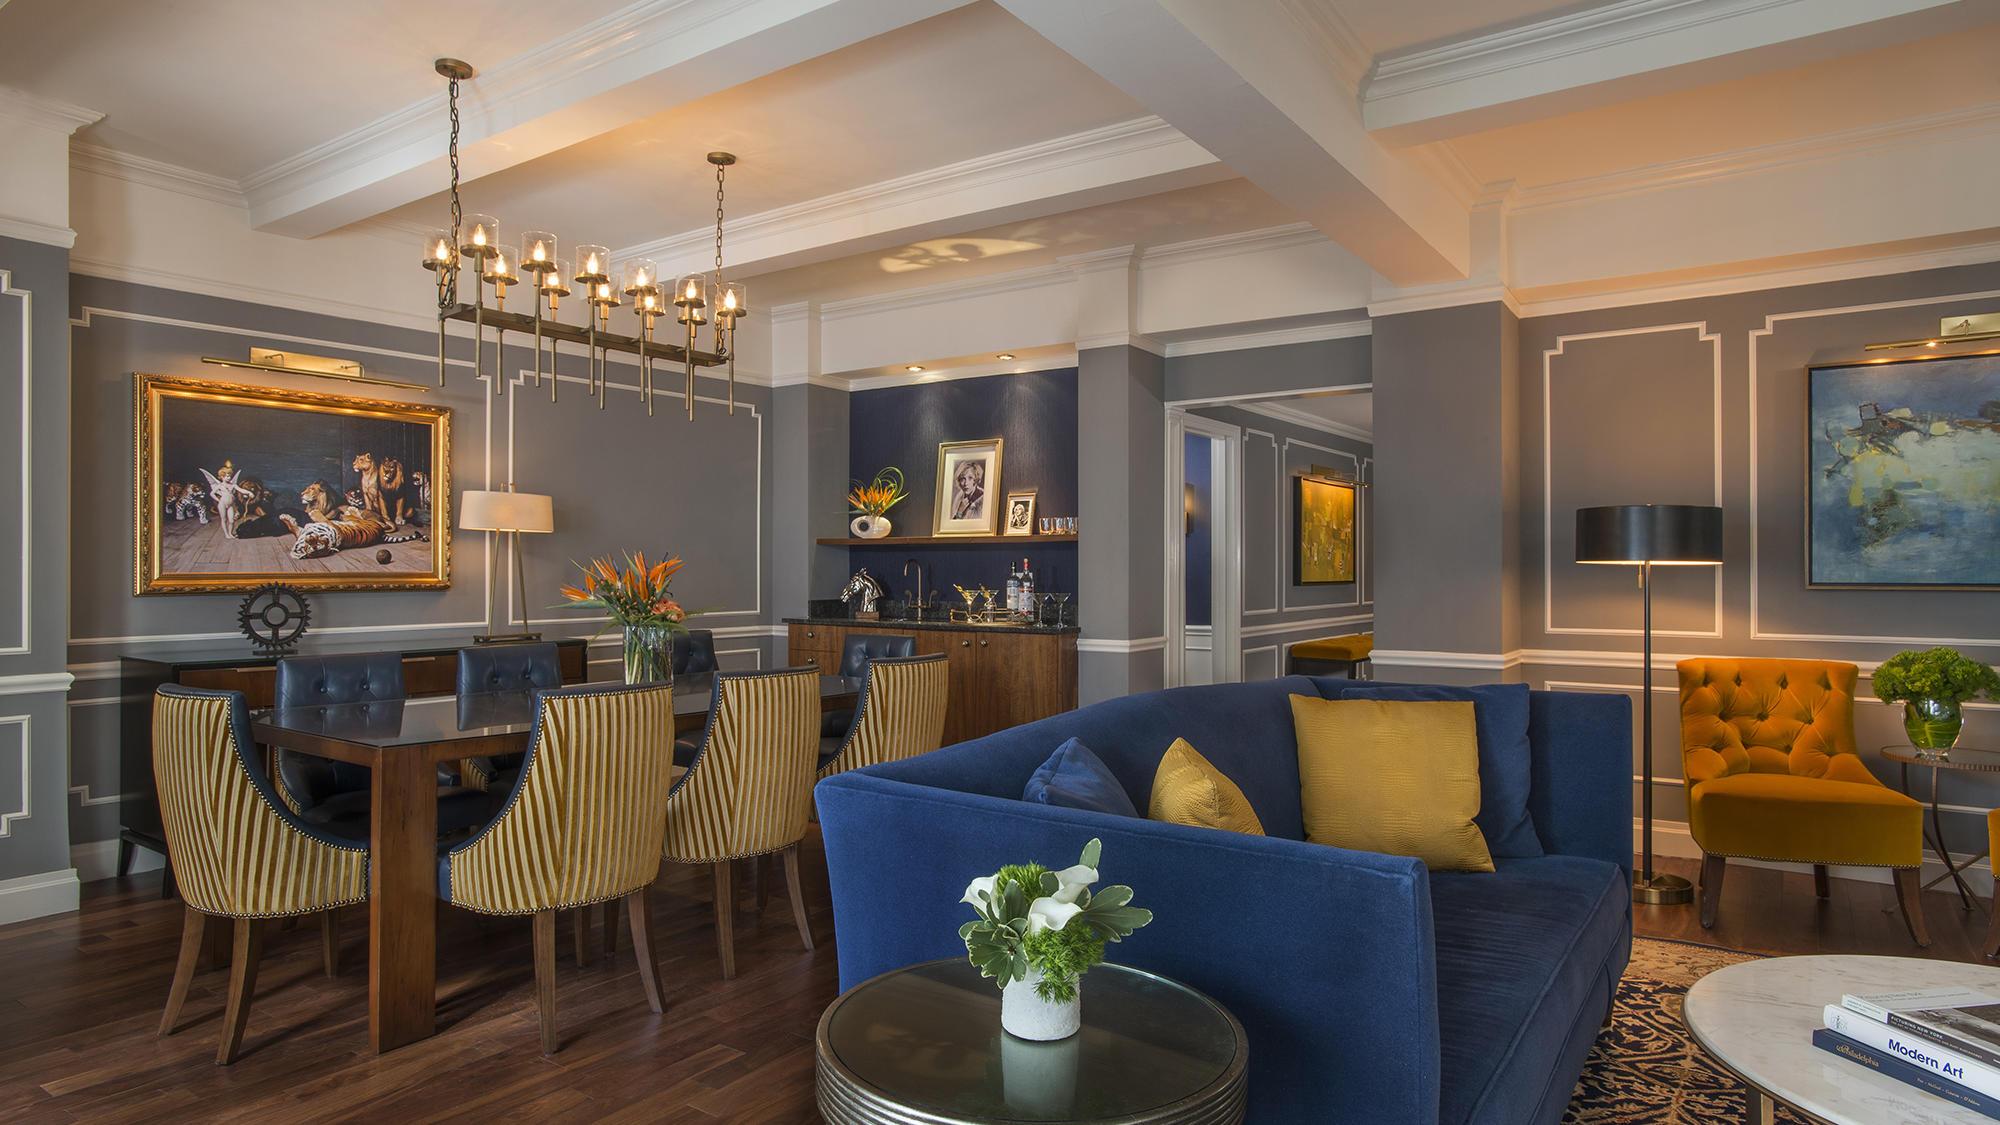 Randolph Suite offer details